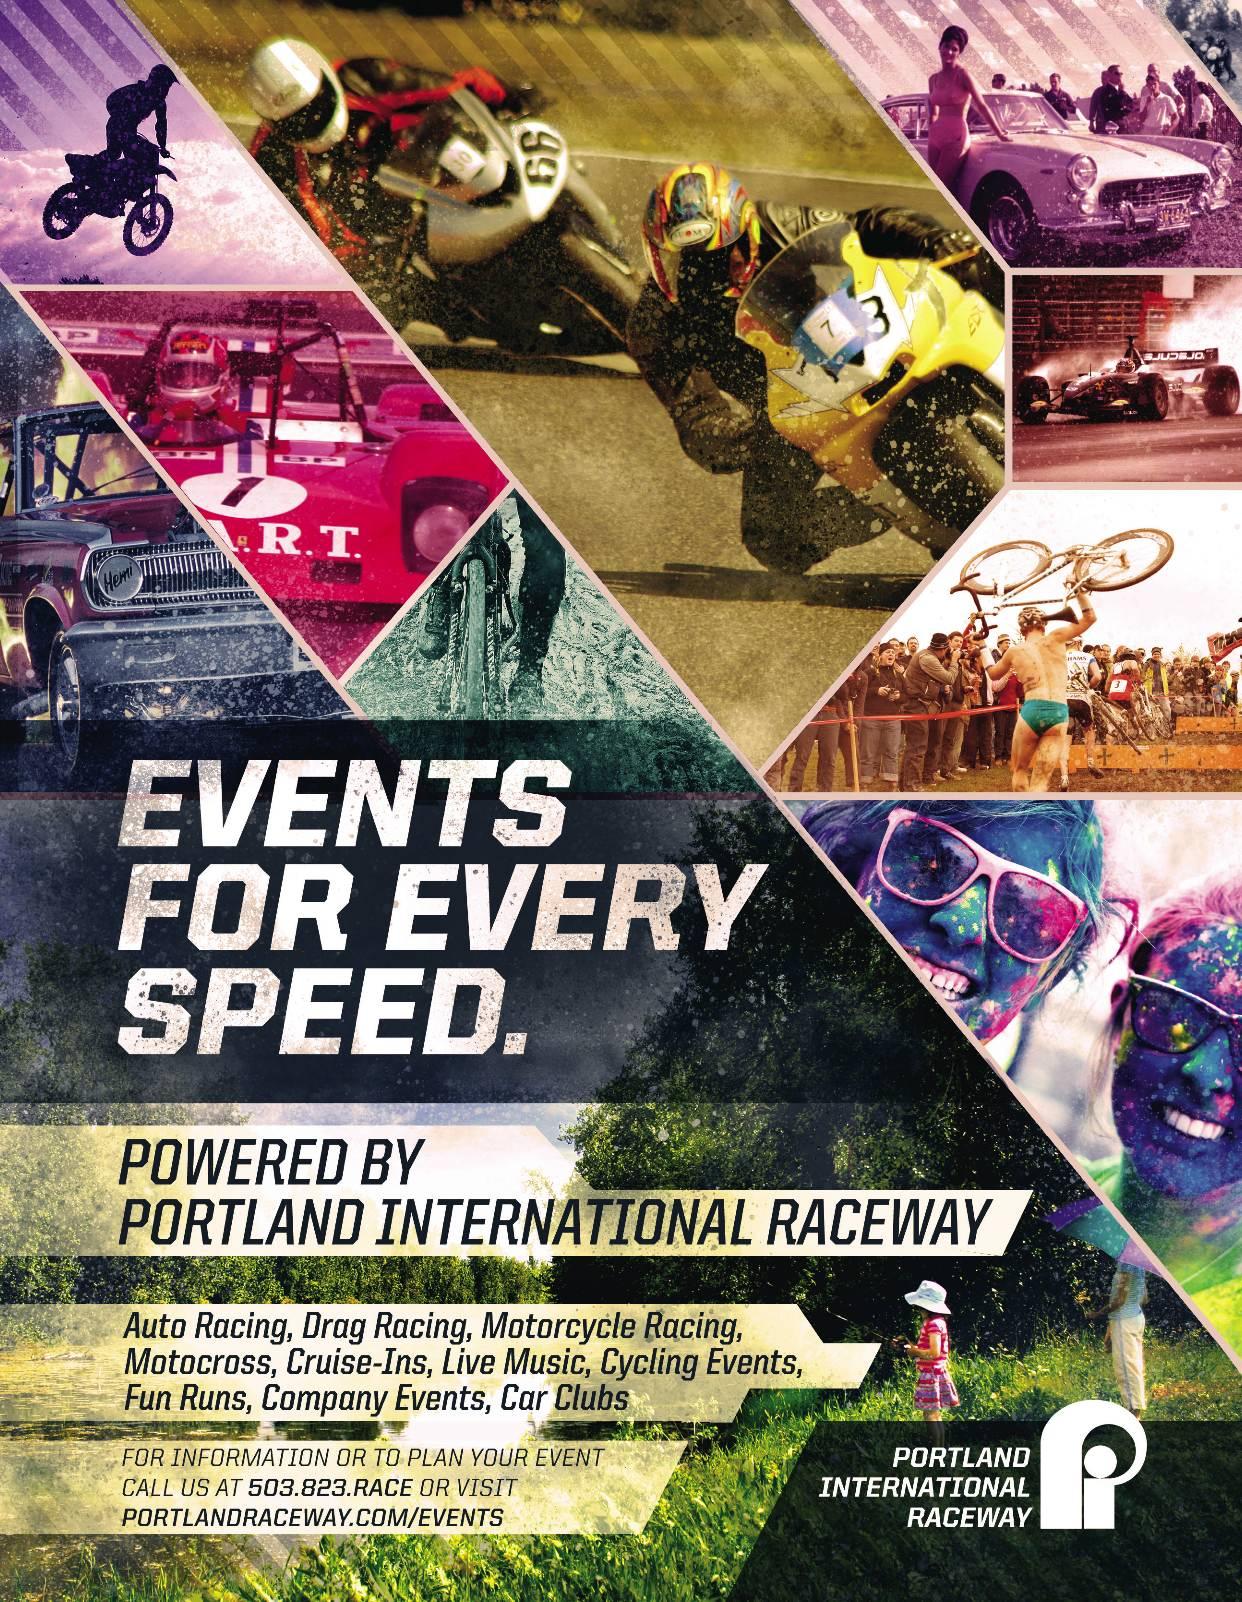 Events for Every Speed - Portland International Raceway